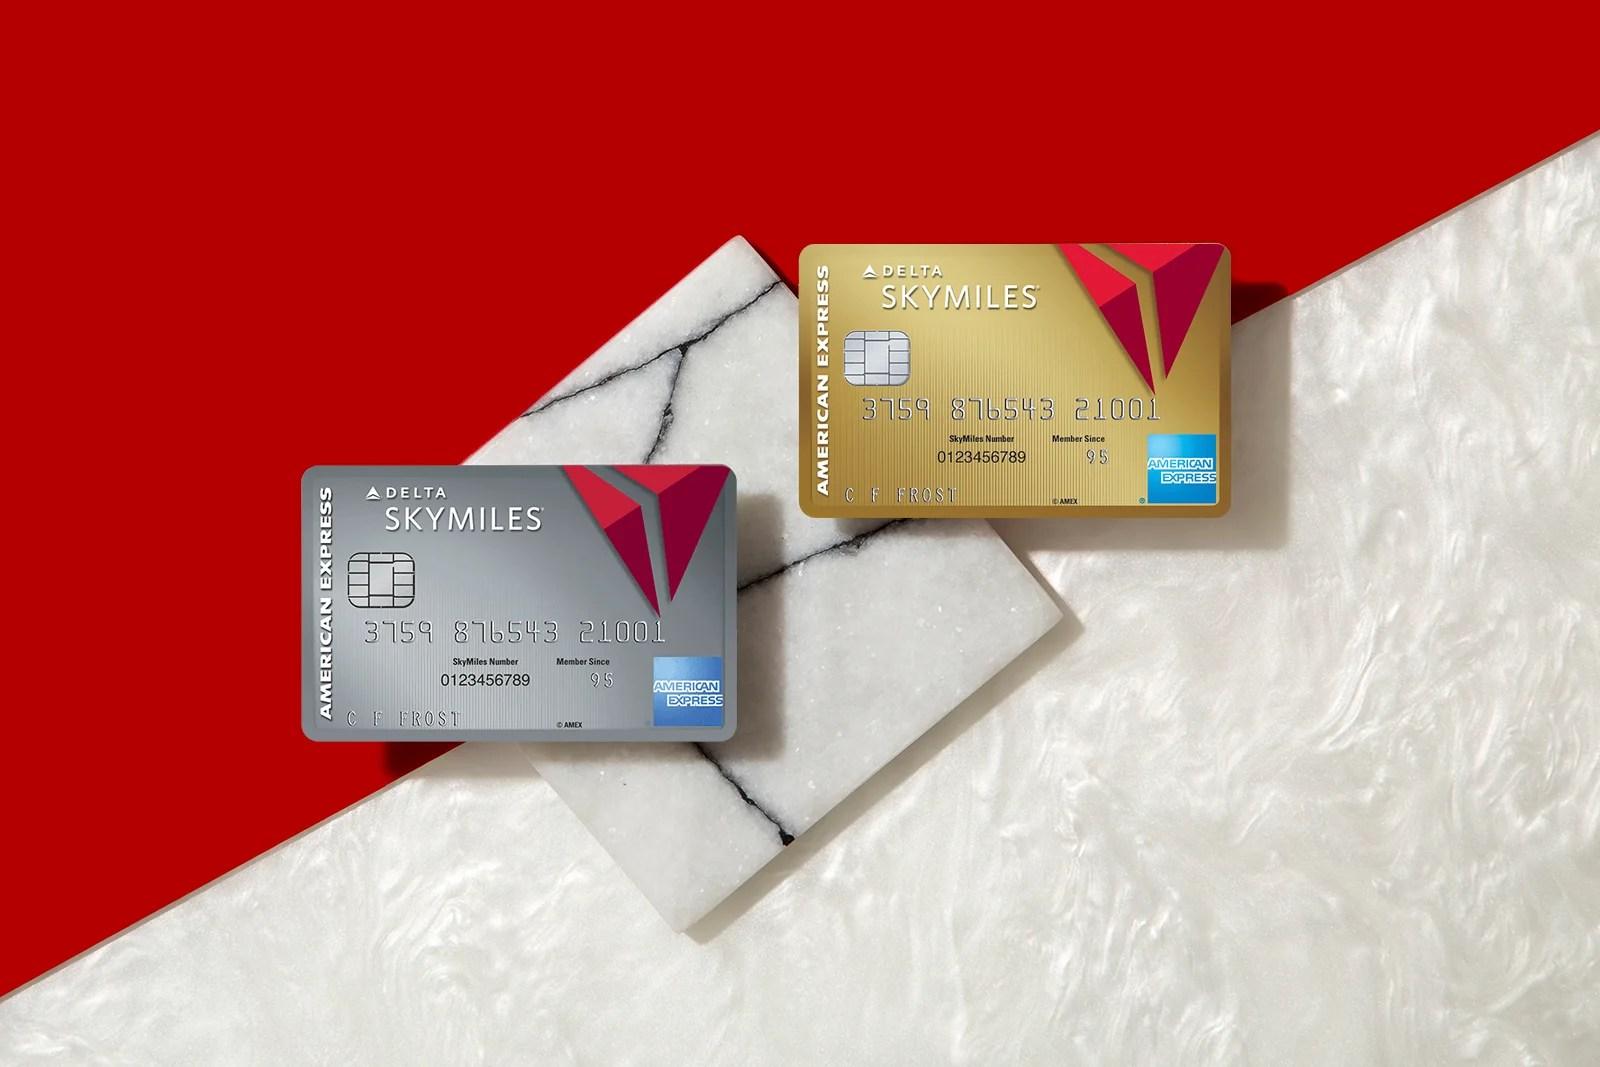 Americanexpress Com Delta >> Which Delta Amex Card Should You Get Gold Delta Vs